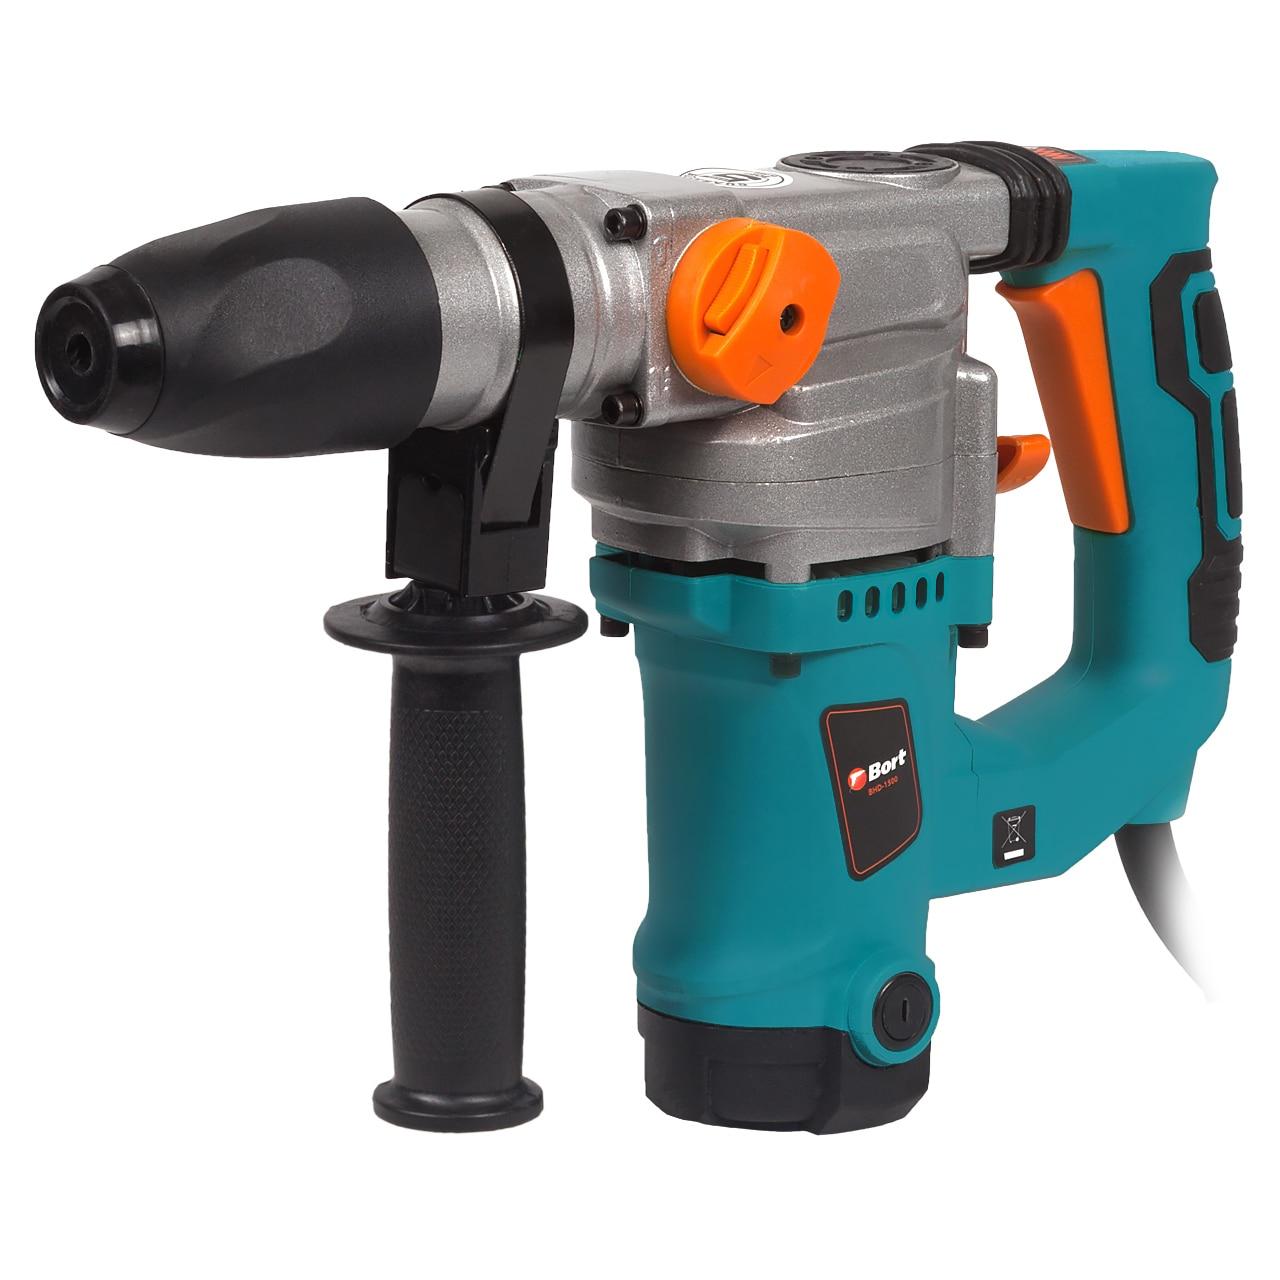 Rotary Hammer Bort BHD-1500 (Power 1300 W, energy impact 6,5Дж, SDS + Chuck, case, cutting bits)